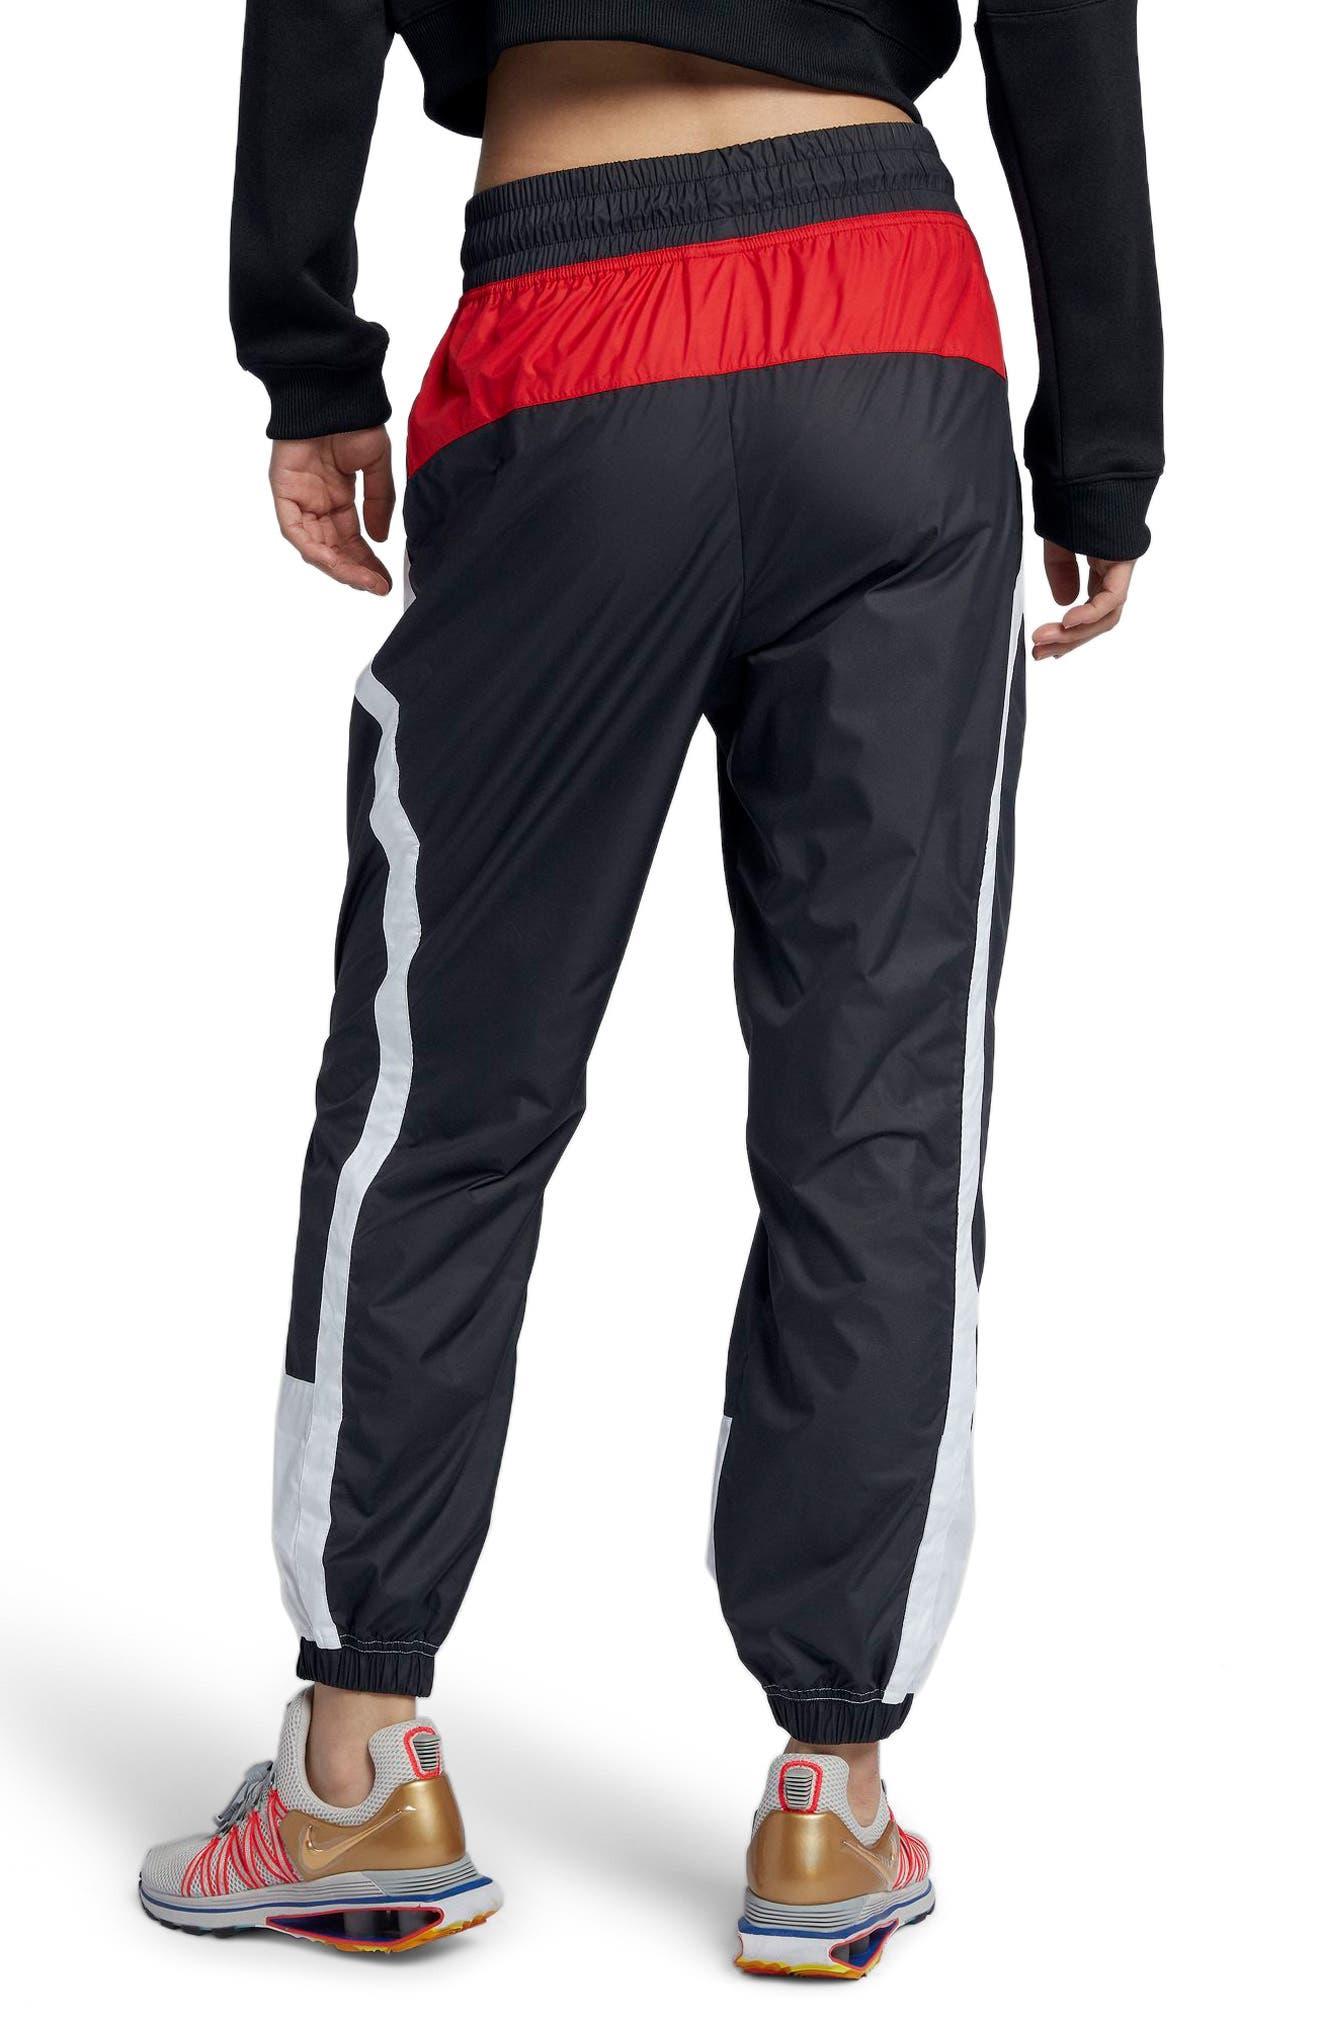 Sportswear Women's Woven Moto Pants,                             Alternate thumbnail 2, color,